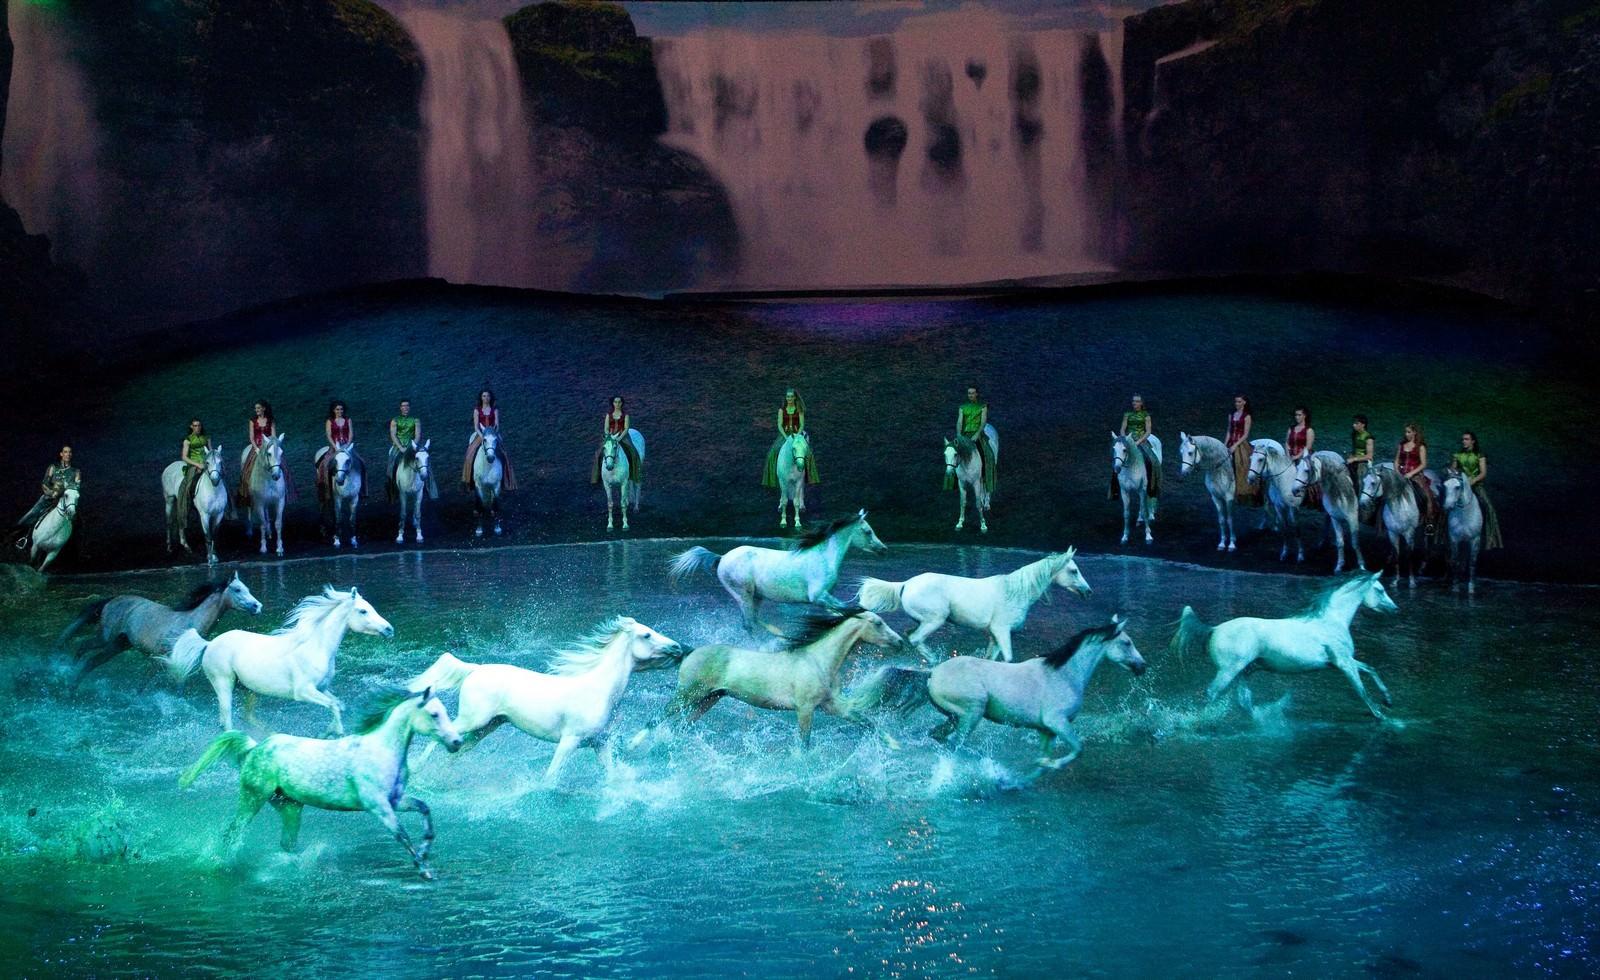 Movie, Odysseo by Cavalia(韓國, 2015年) / 夢幻舞馬-卡瓦利亞(台灣), 電影劇照, 表演內容介紹